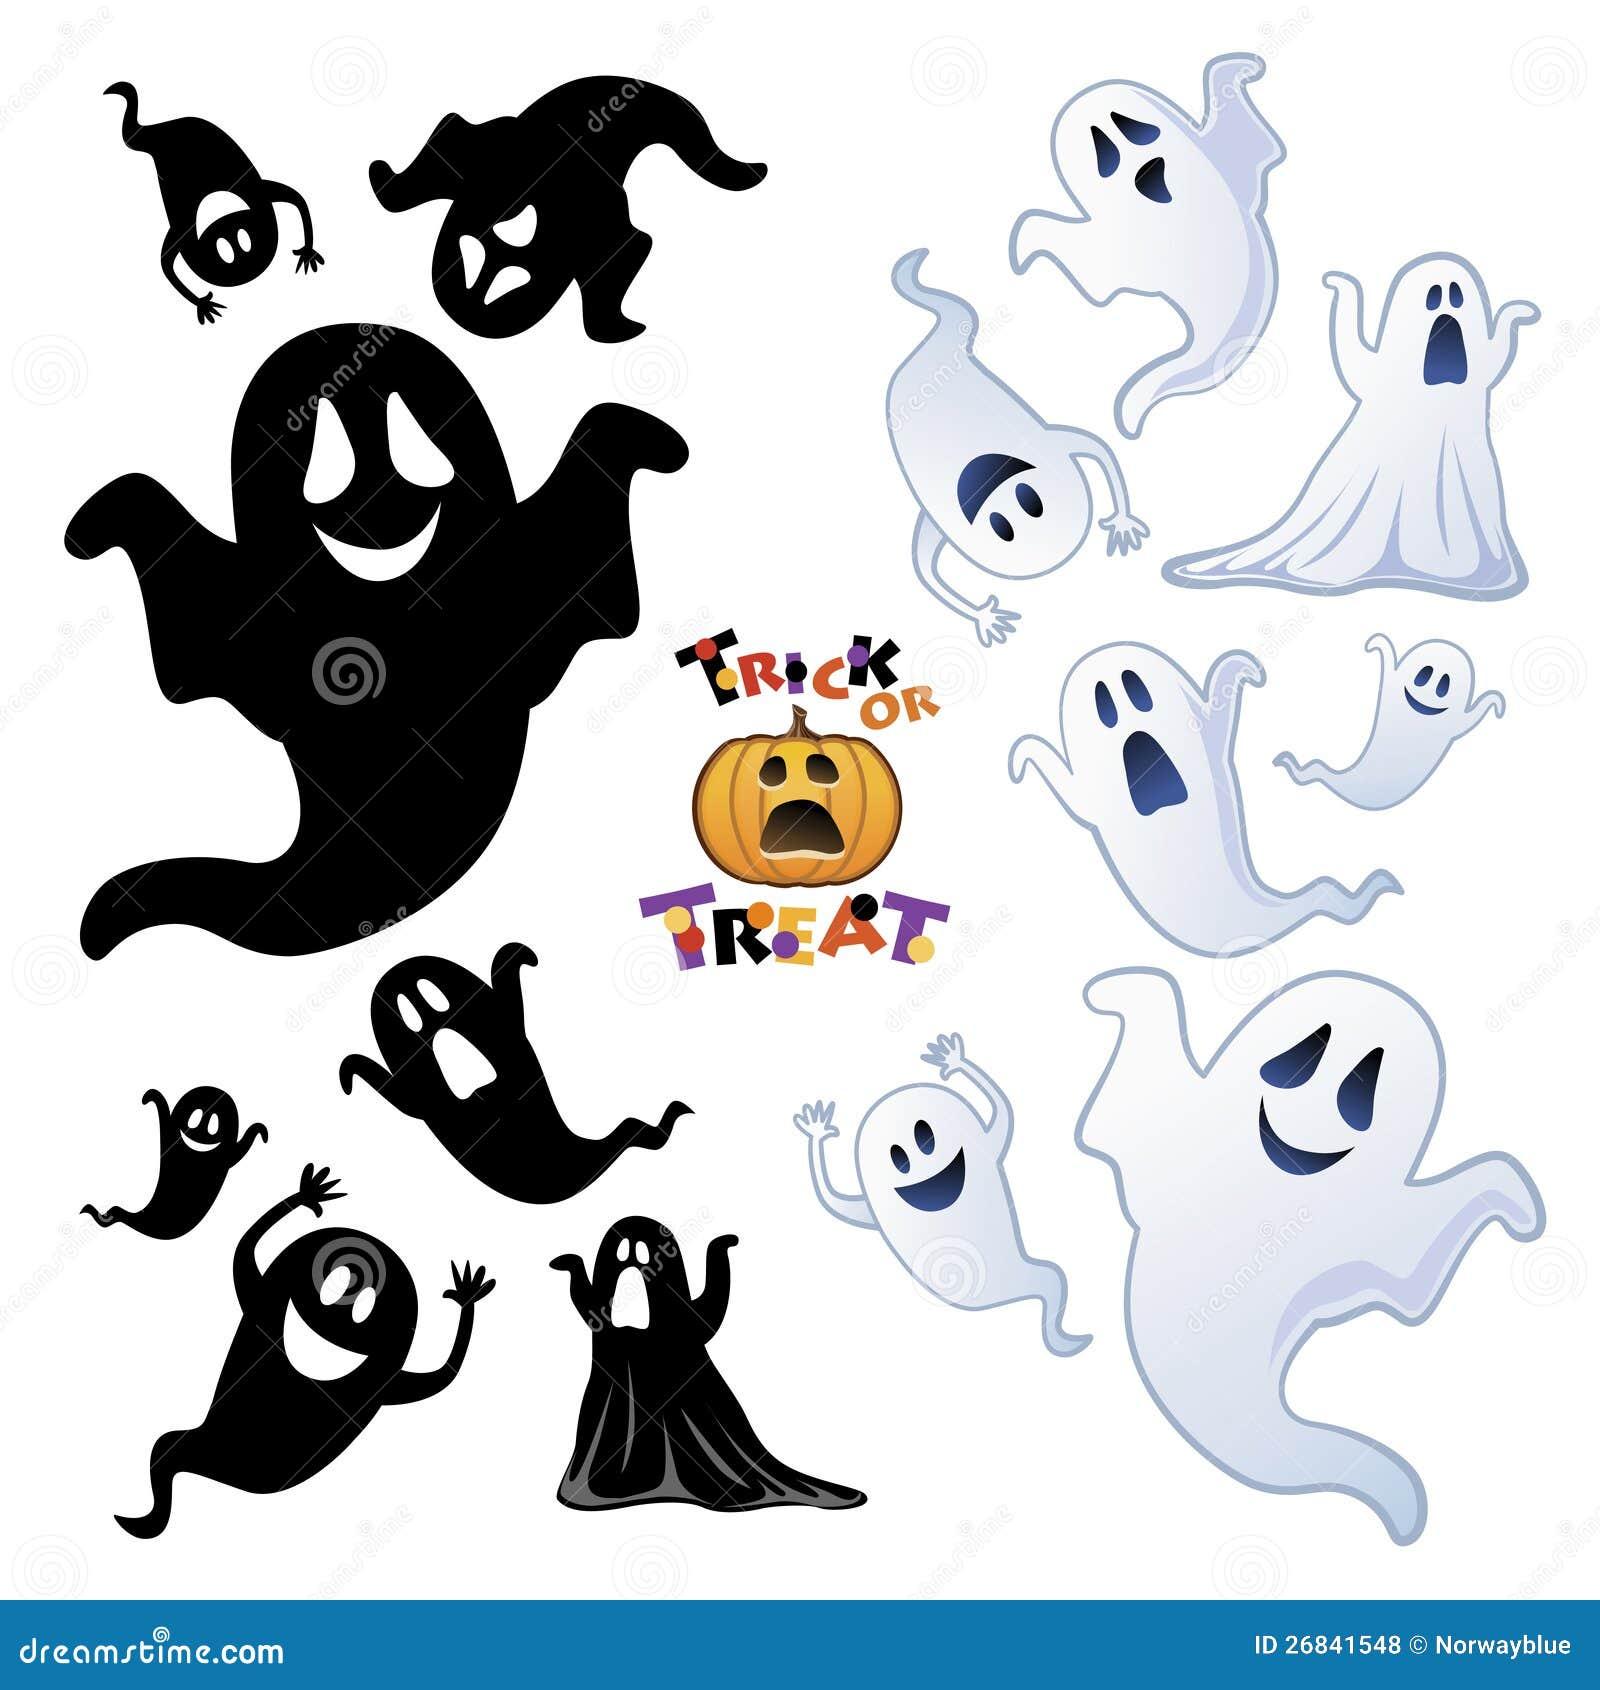 Insieme del fantasma di Halloween, siluetta del fantasma